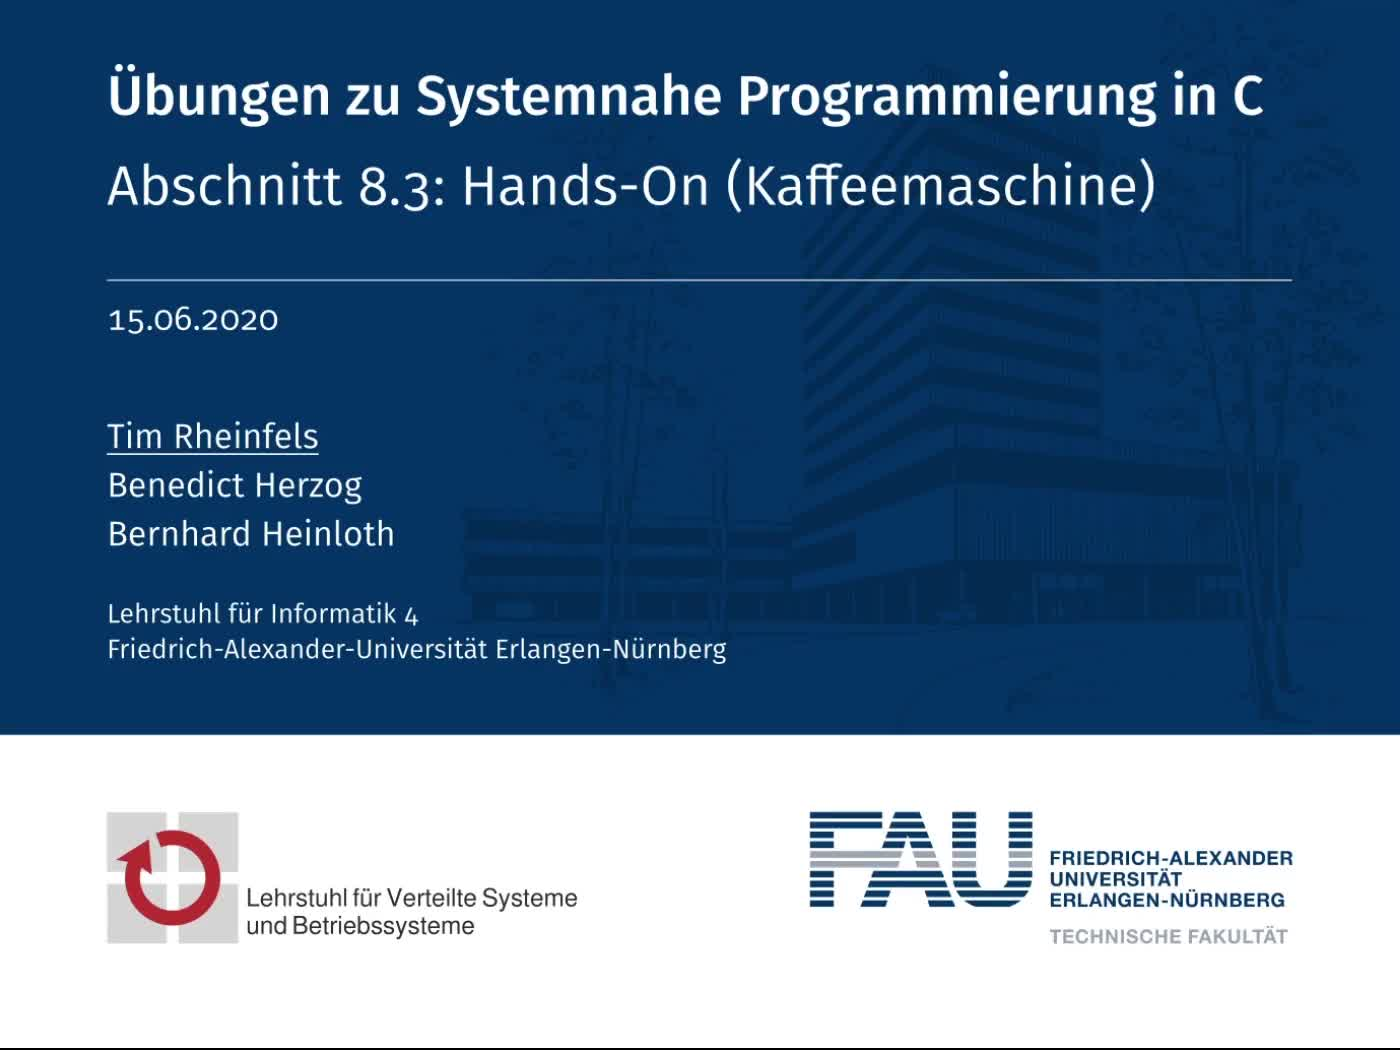 08.3: Hands-On (Kaffeemaschine) preview image